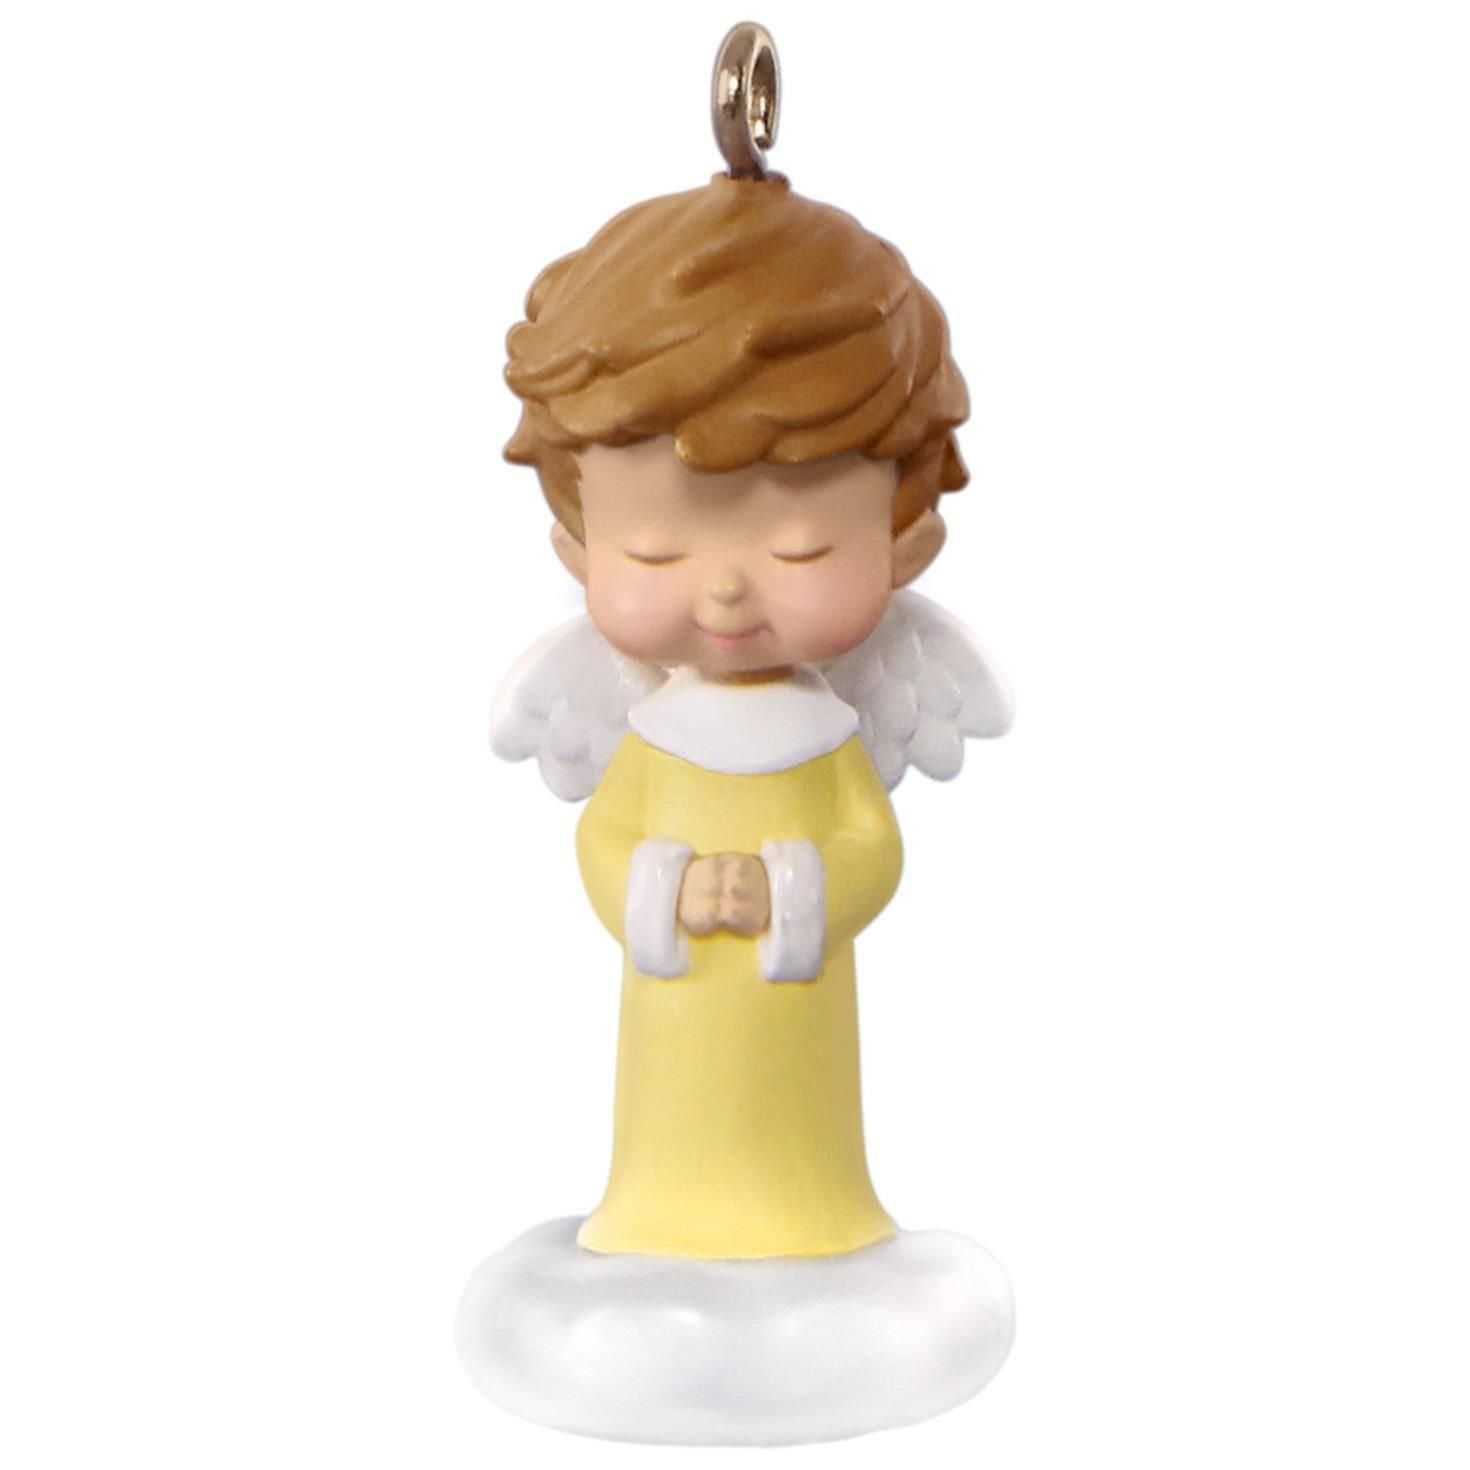 Hallmark Keepsake 2017 Honeysuckle: Mary's Angels Christmas Ornament